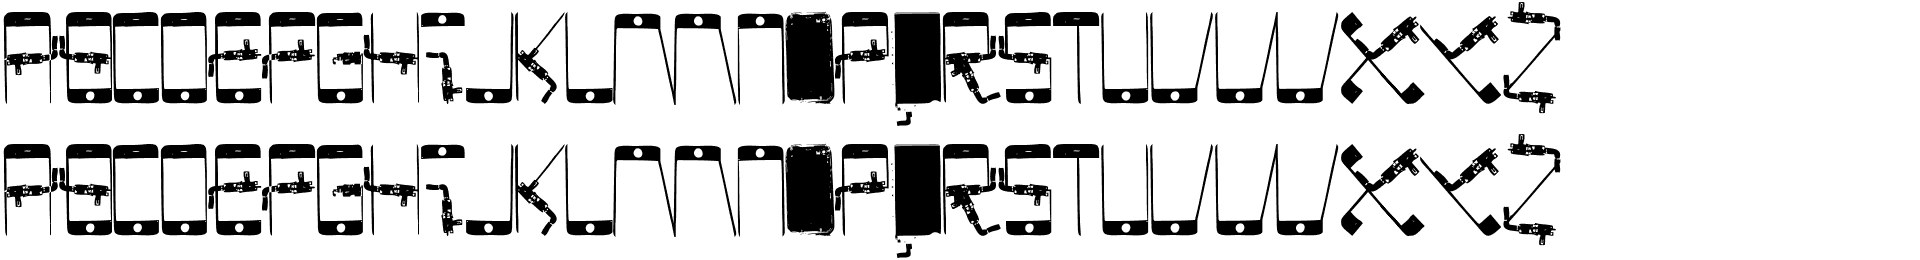 PHONE SCAN